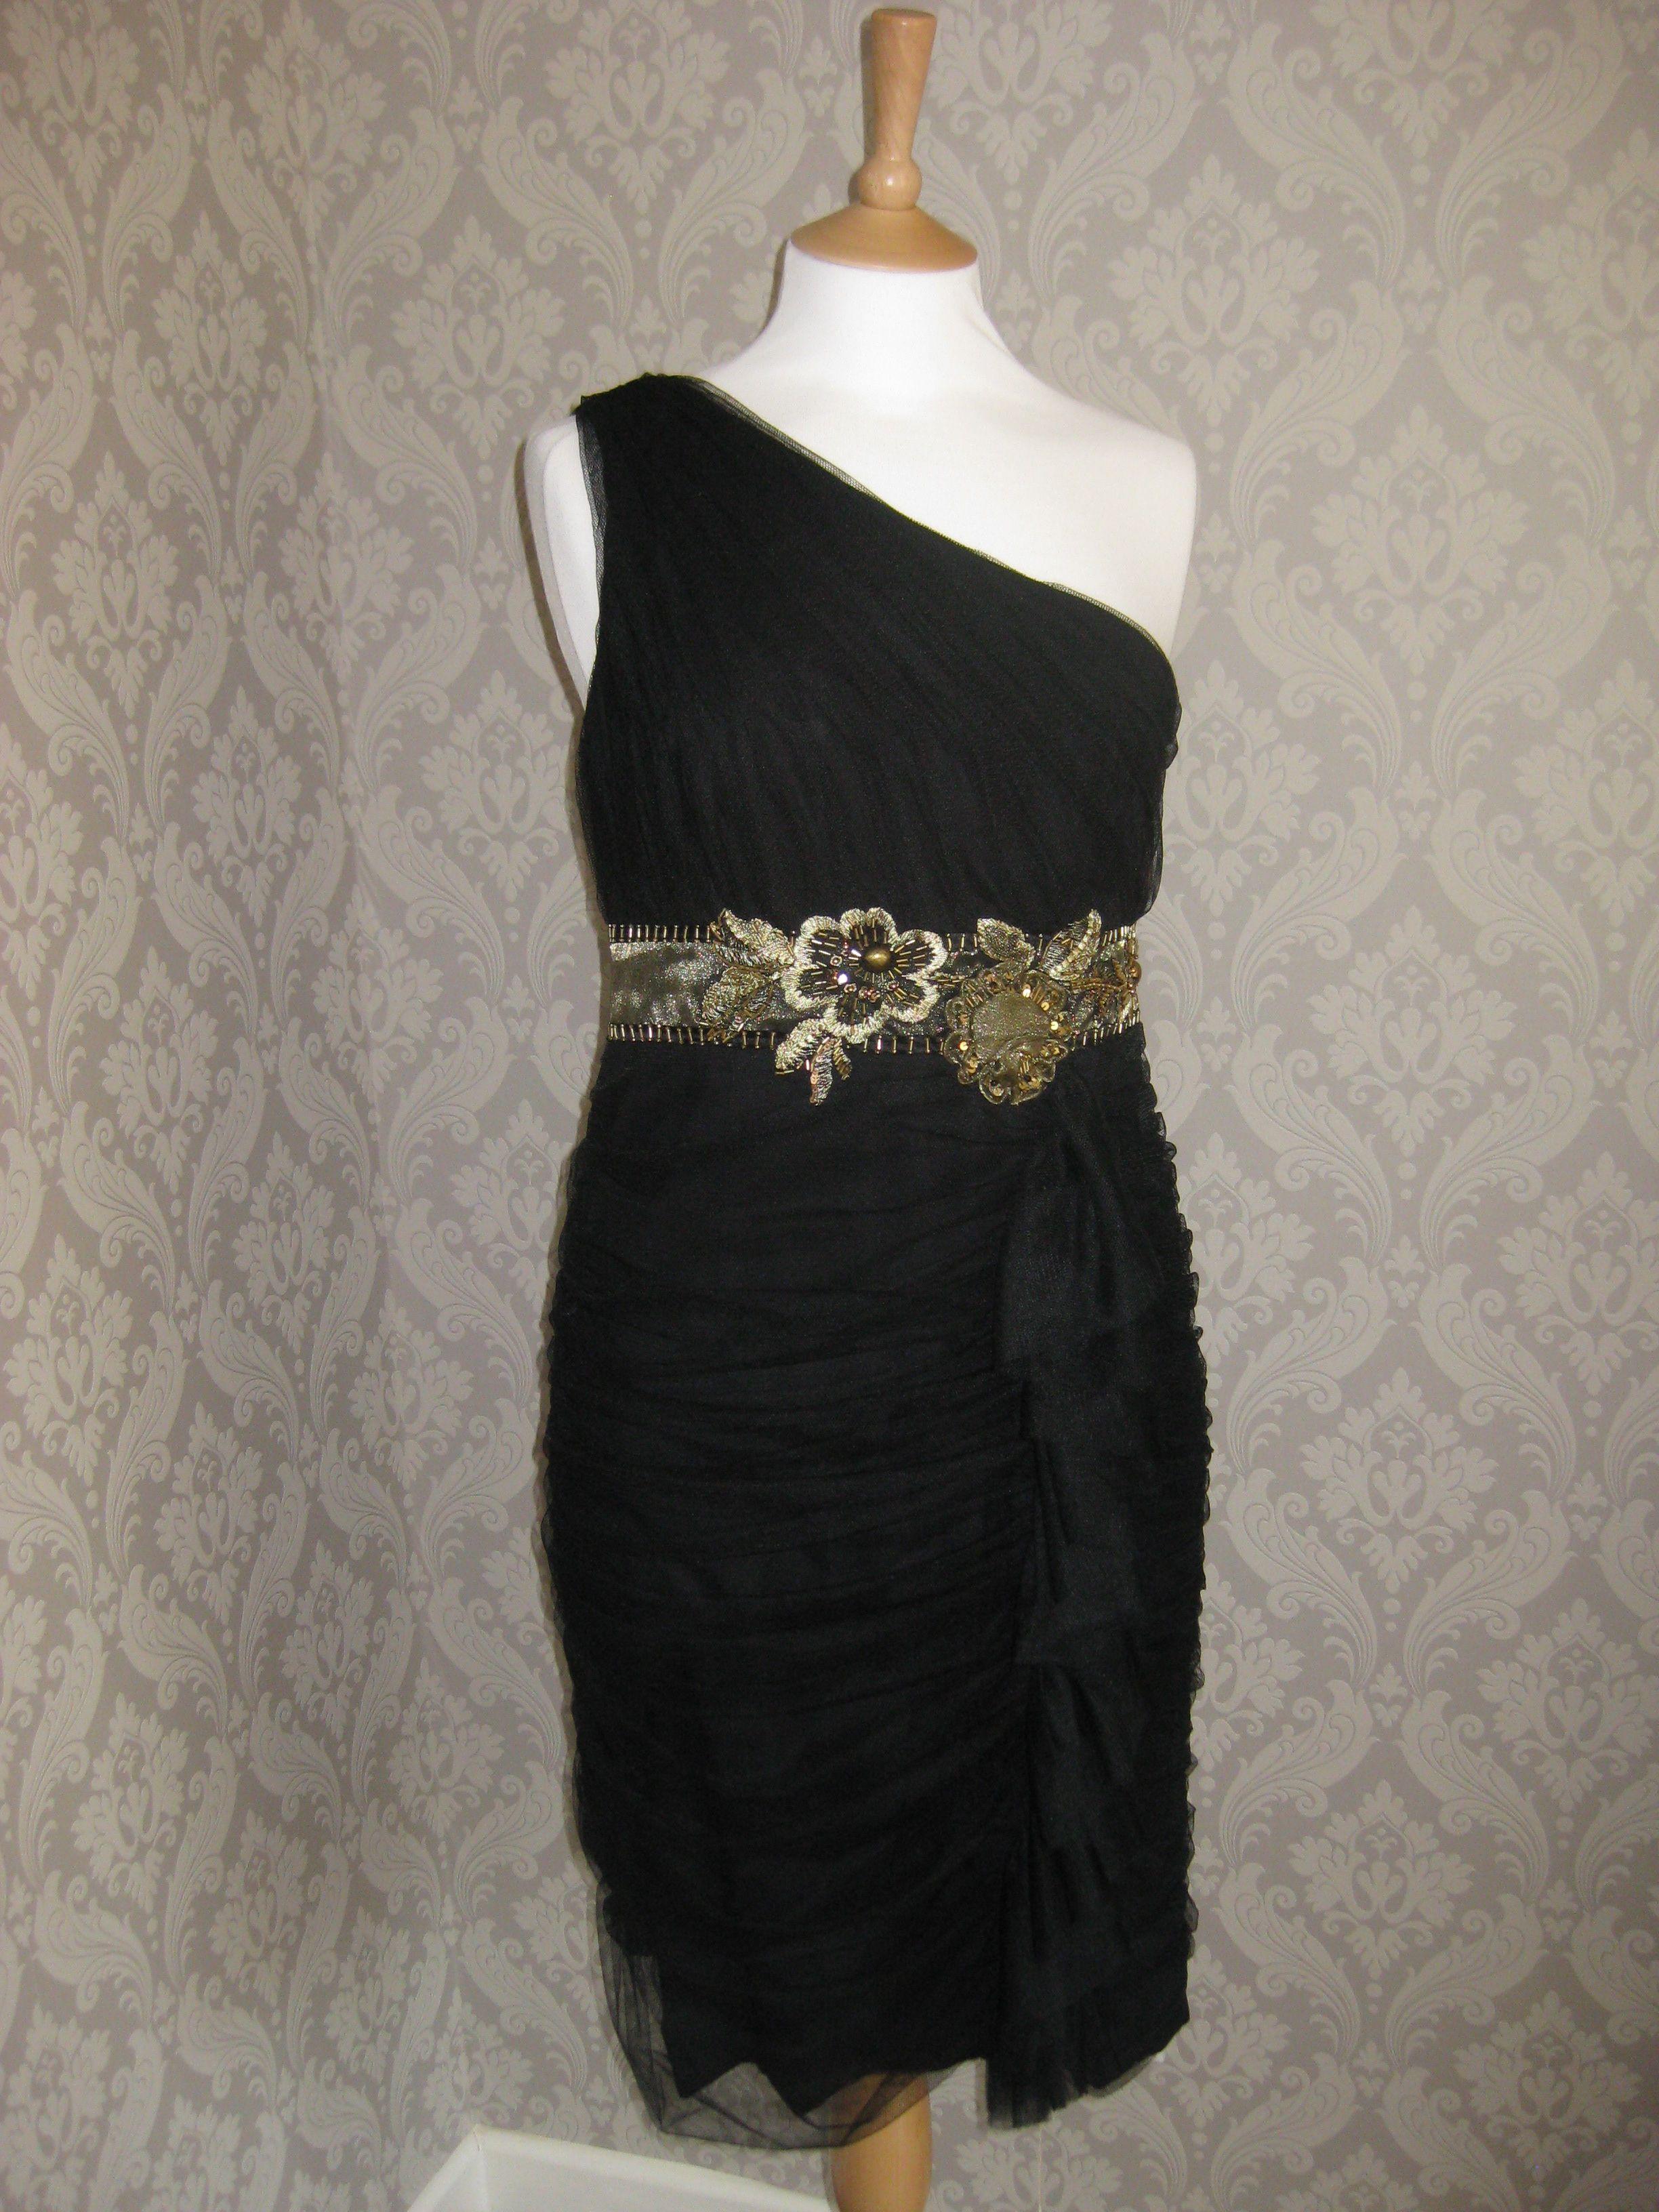 Fab one shoulder black dress available to rent on our website renymydress.ie #Occasionwear #ocassiondresses #dresshiredublin #dresshireireland #Blackdress #oneshoulderdress #flattering #Black